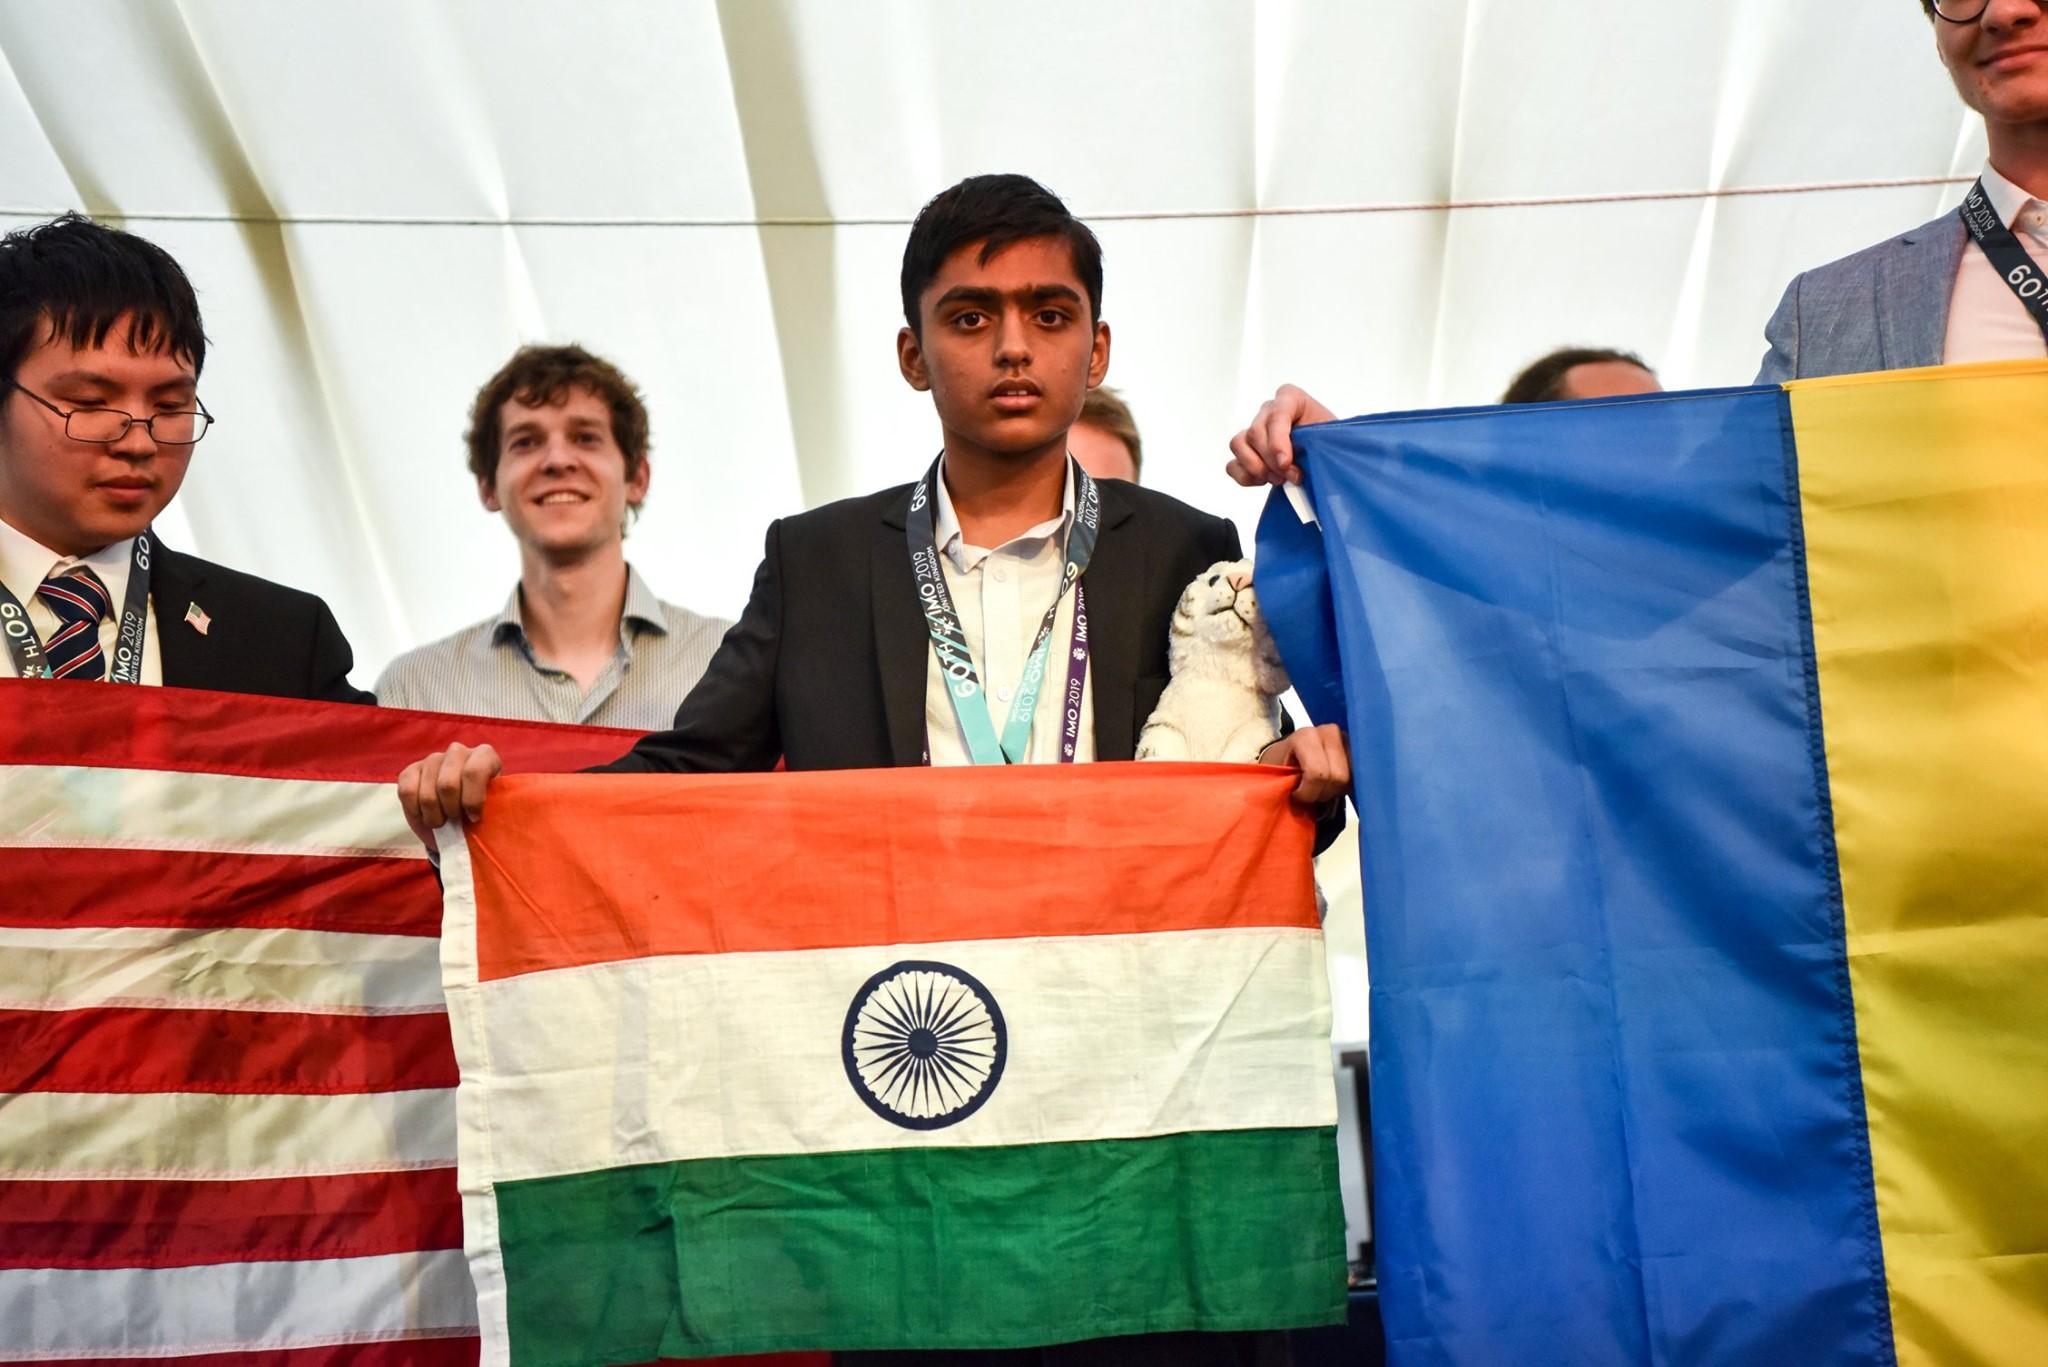 Bengaluru boy wins gold at Mathematics Olympiad | Deccan Herald